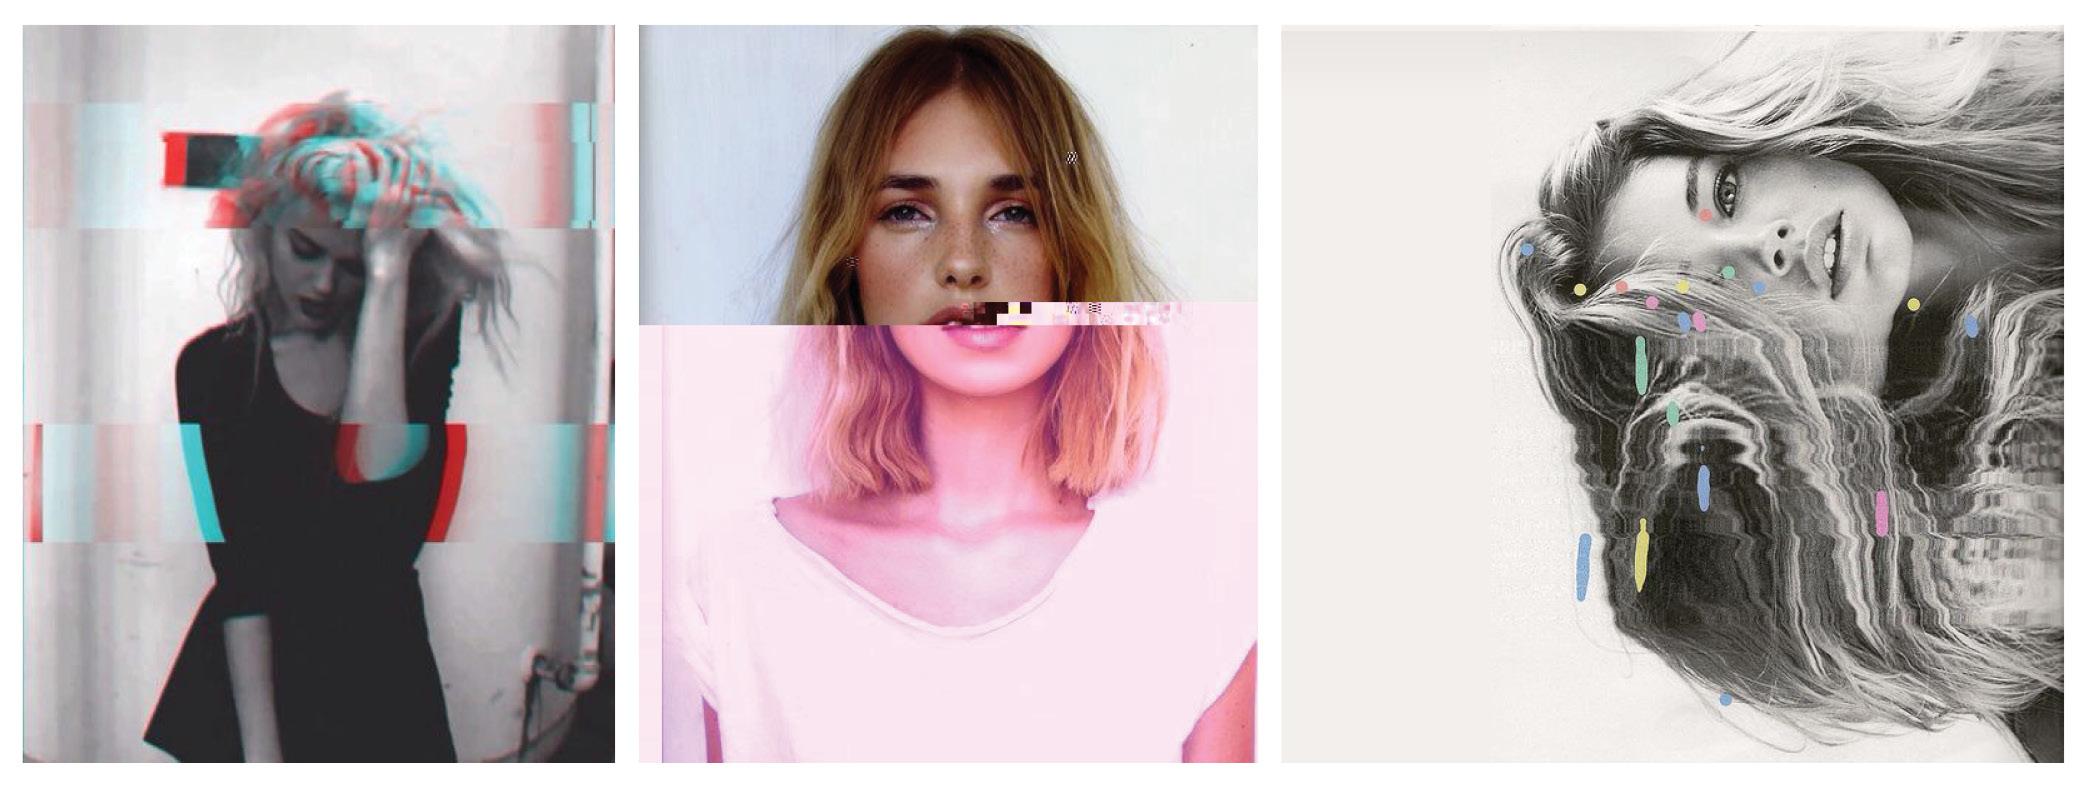 Glitch photography trend